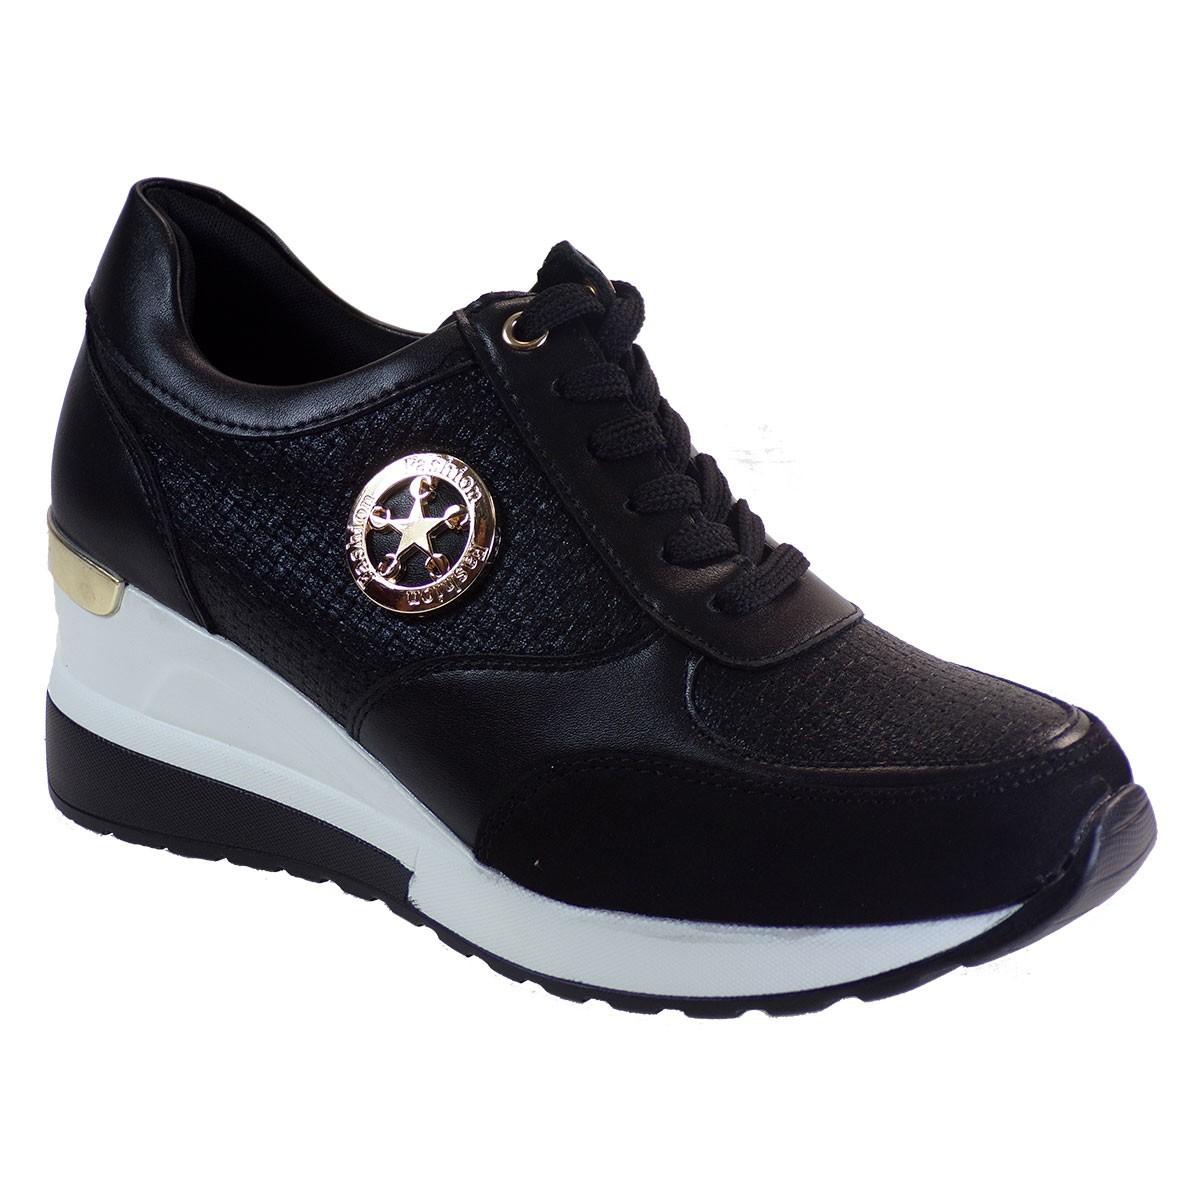 Bagiota Shoes Γυναικεία Παπούτσια Sneakers Αθλητικά Υ9500 Μαύρο